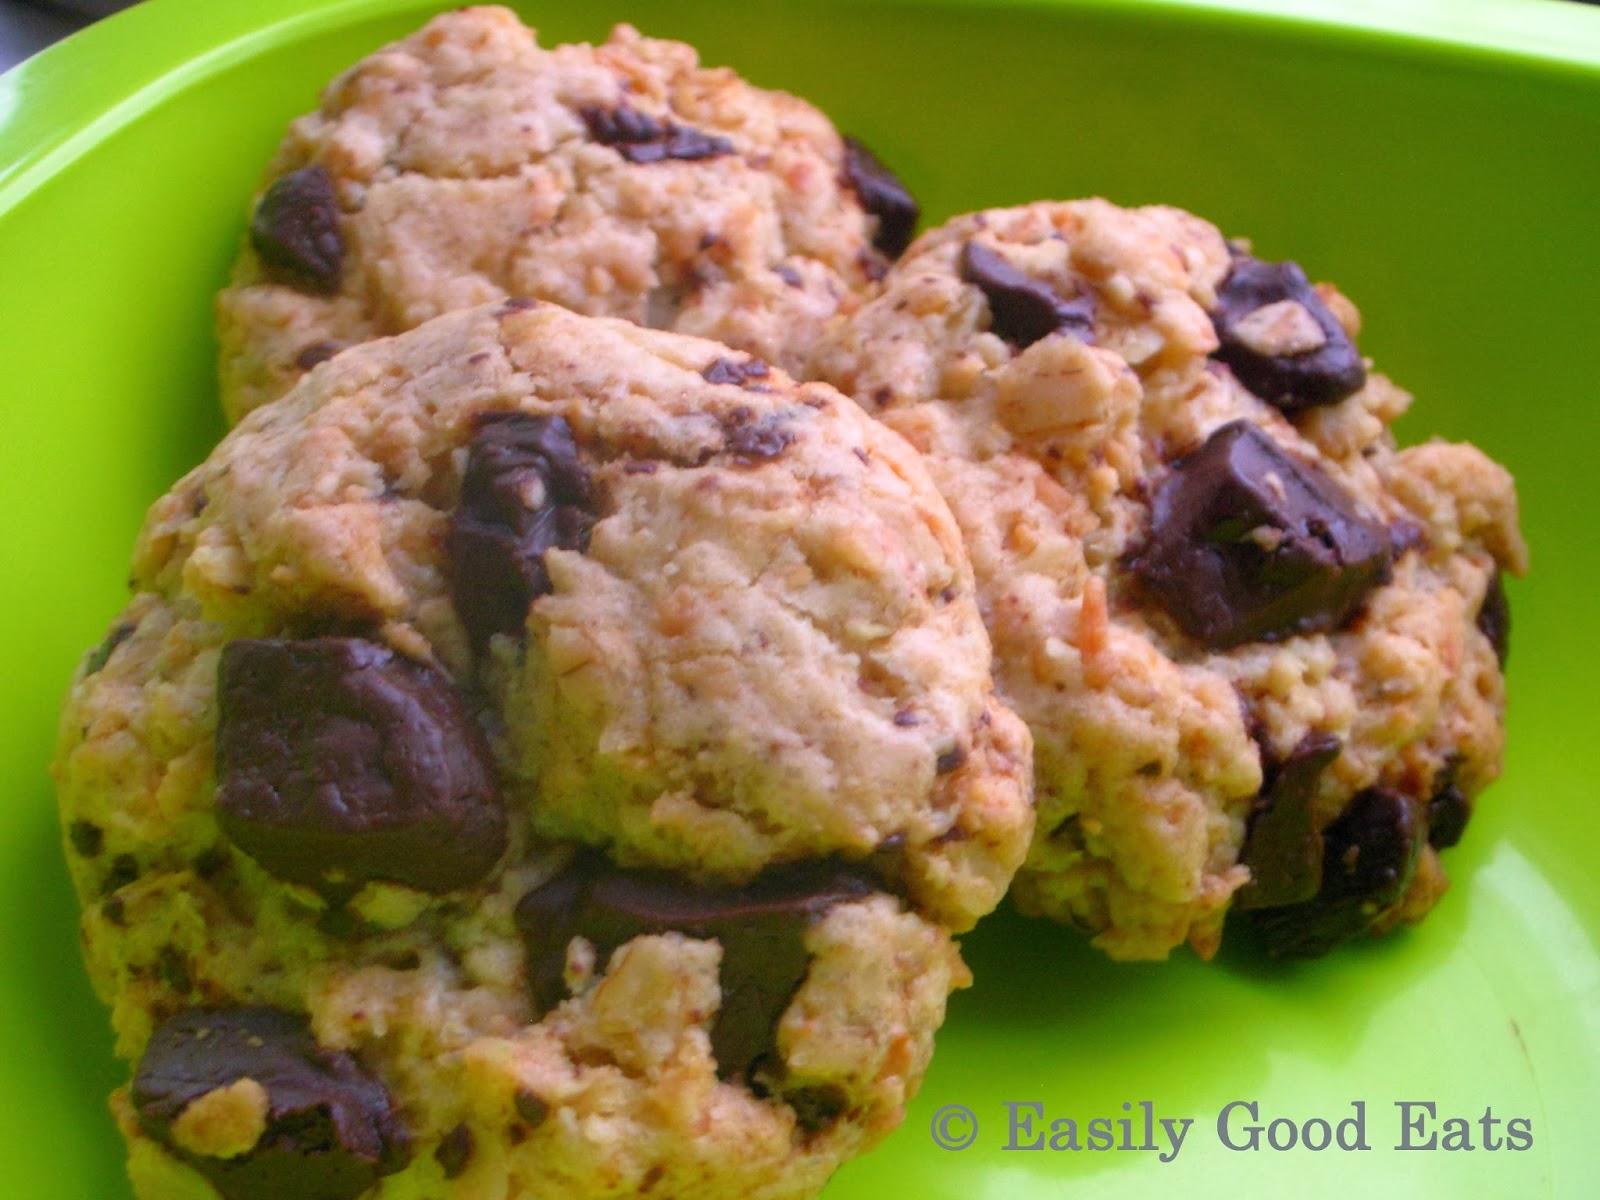 Chocolate+chip+coconut+oat+cookies+(2).jpg